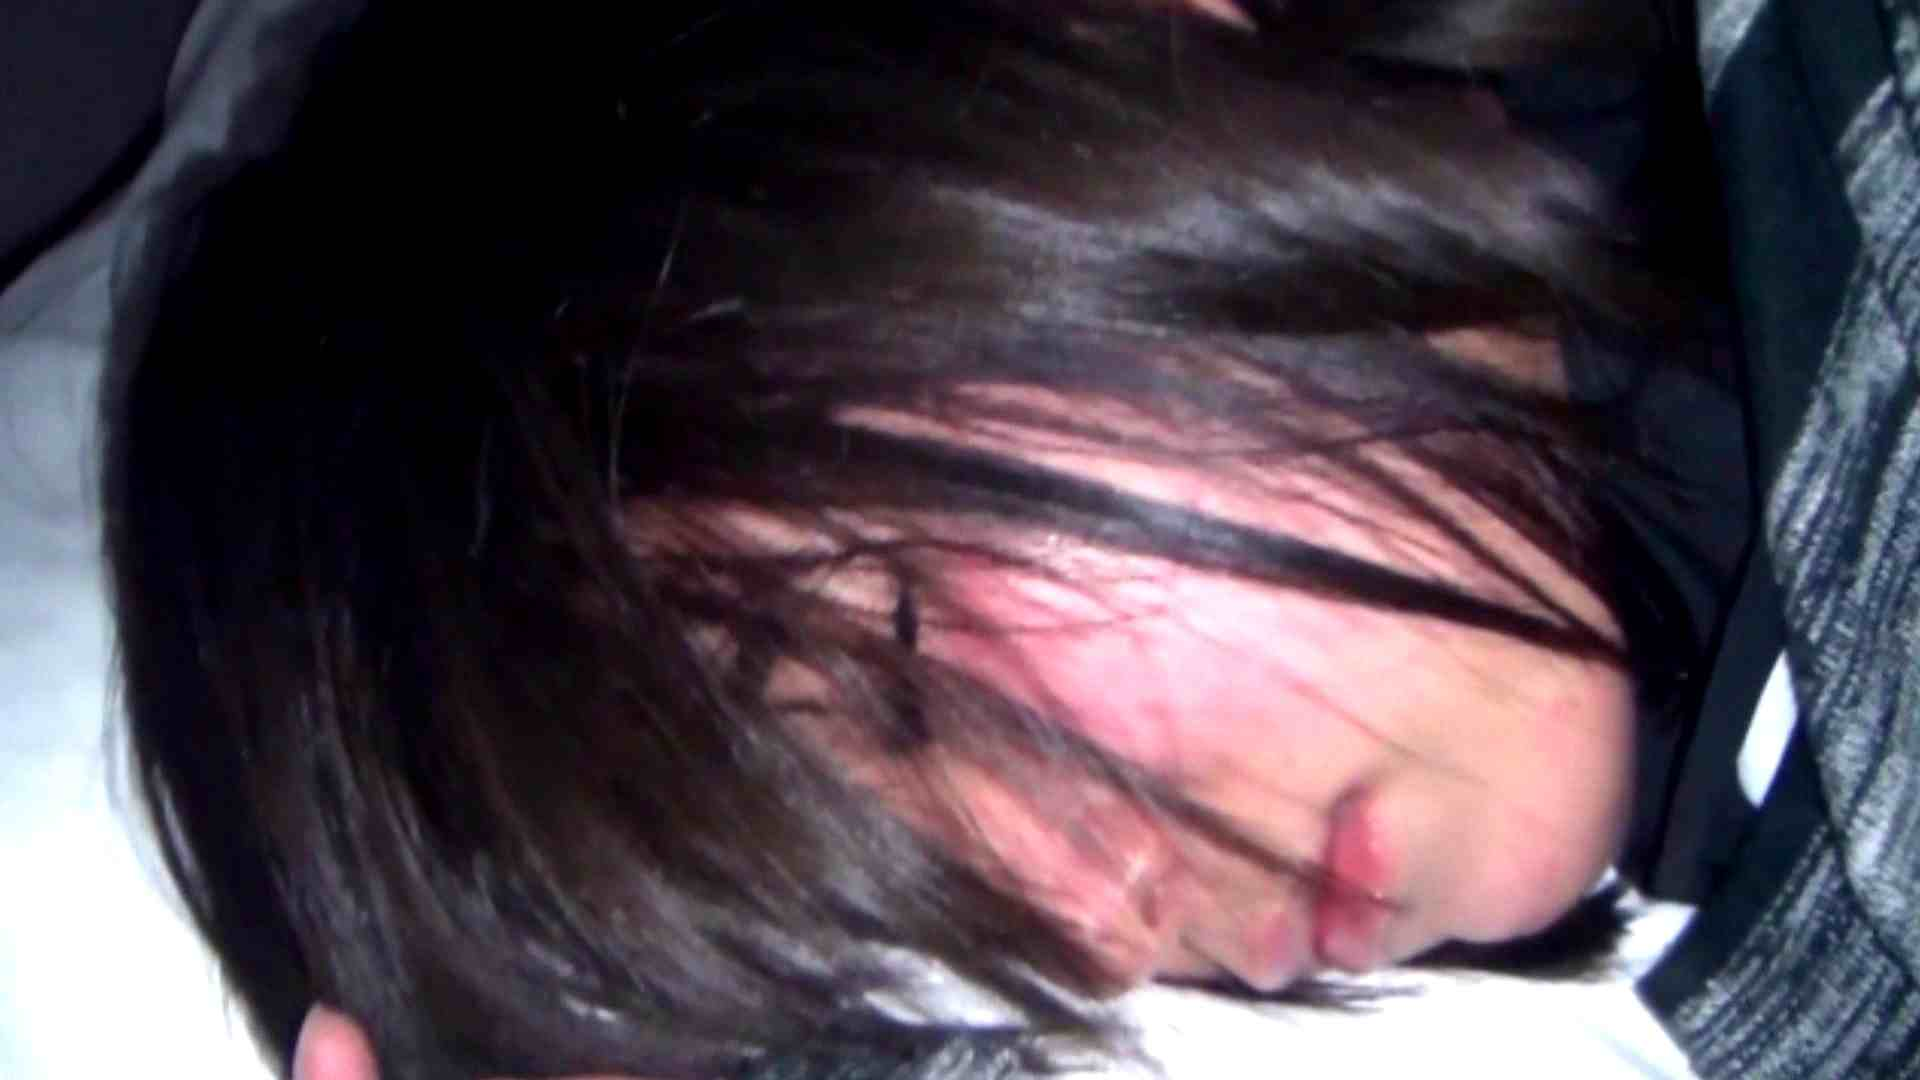 vol.34 【AIちゃん】 黒髪19歳 夏休みのプチ家出中 1回目 OLハメ撮り  22Pix 8